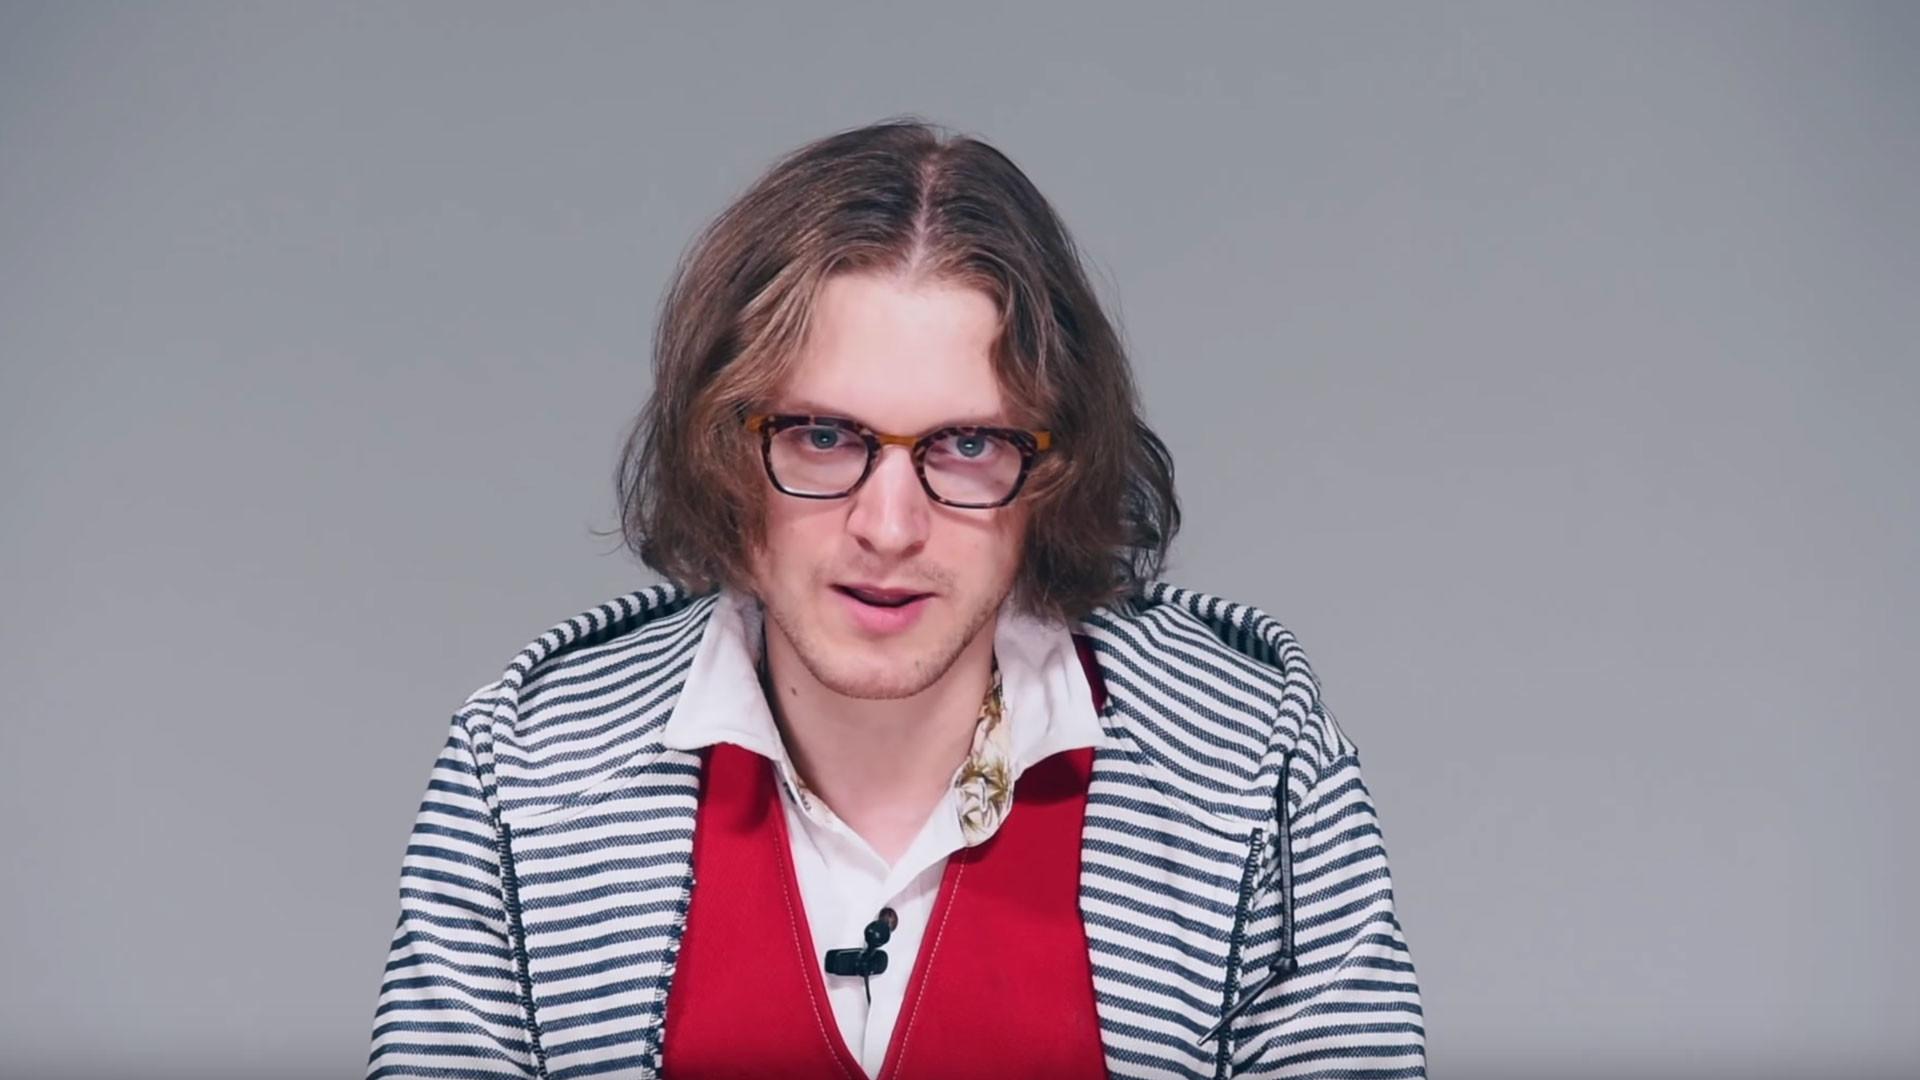 Михаил Светов. Скриншот видео: youtube/SVTV